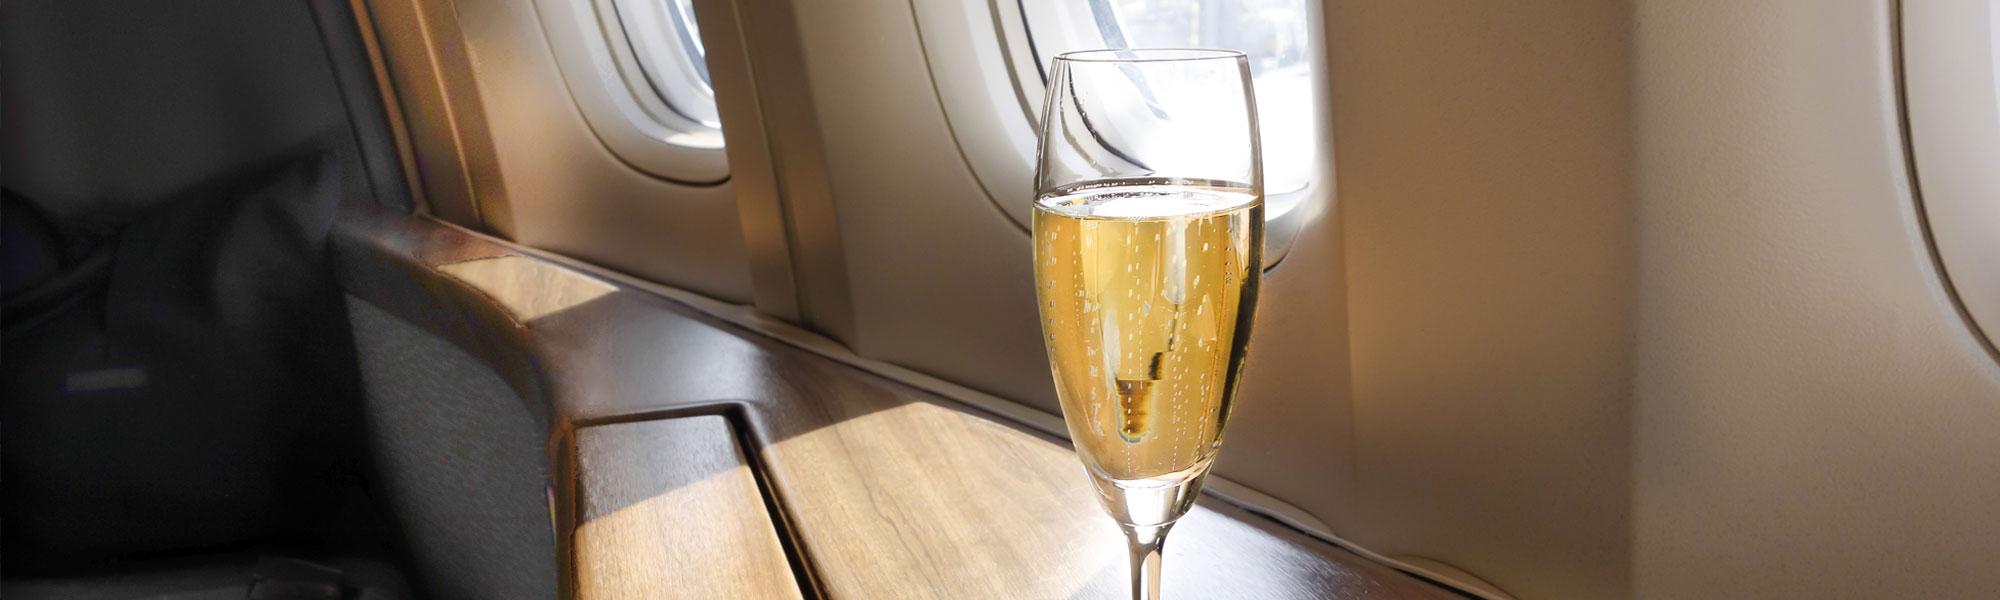 White wine near plane window